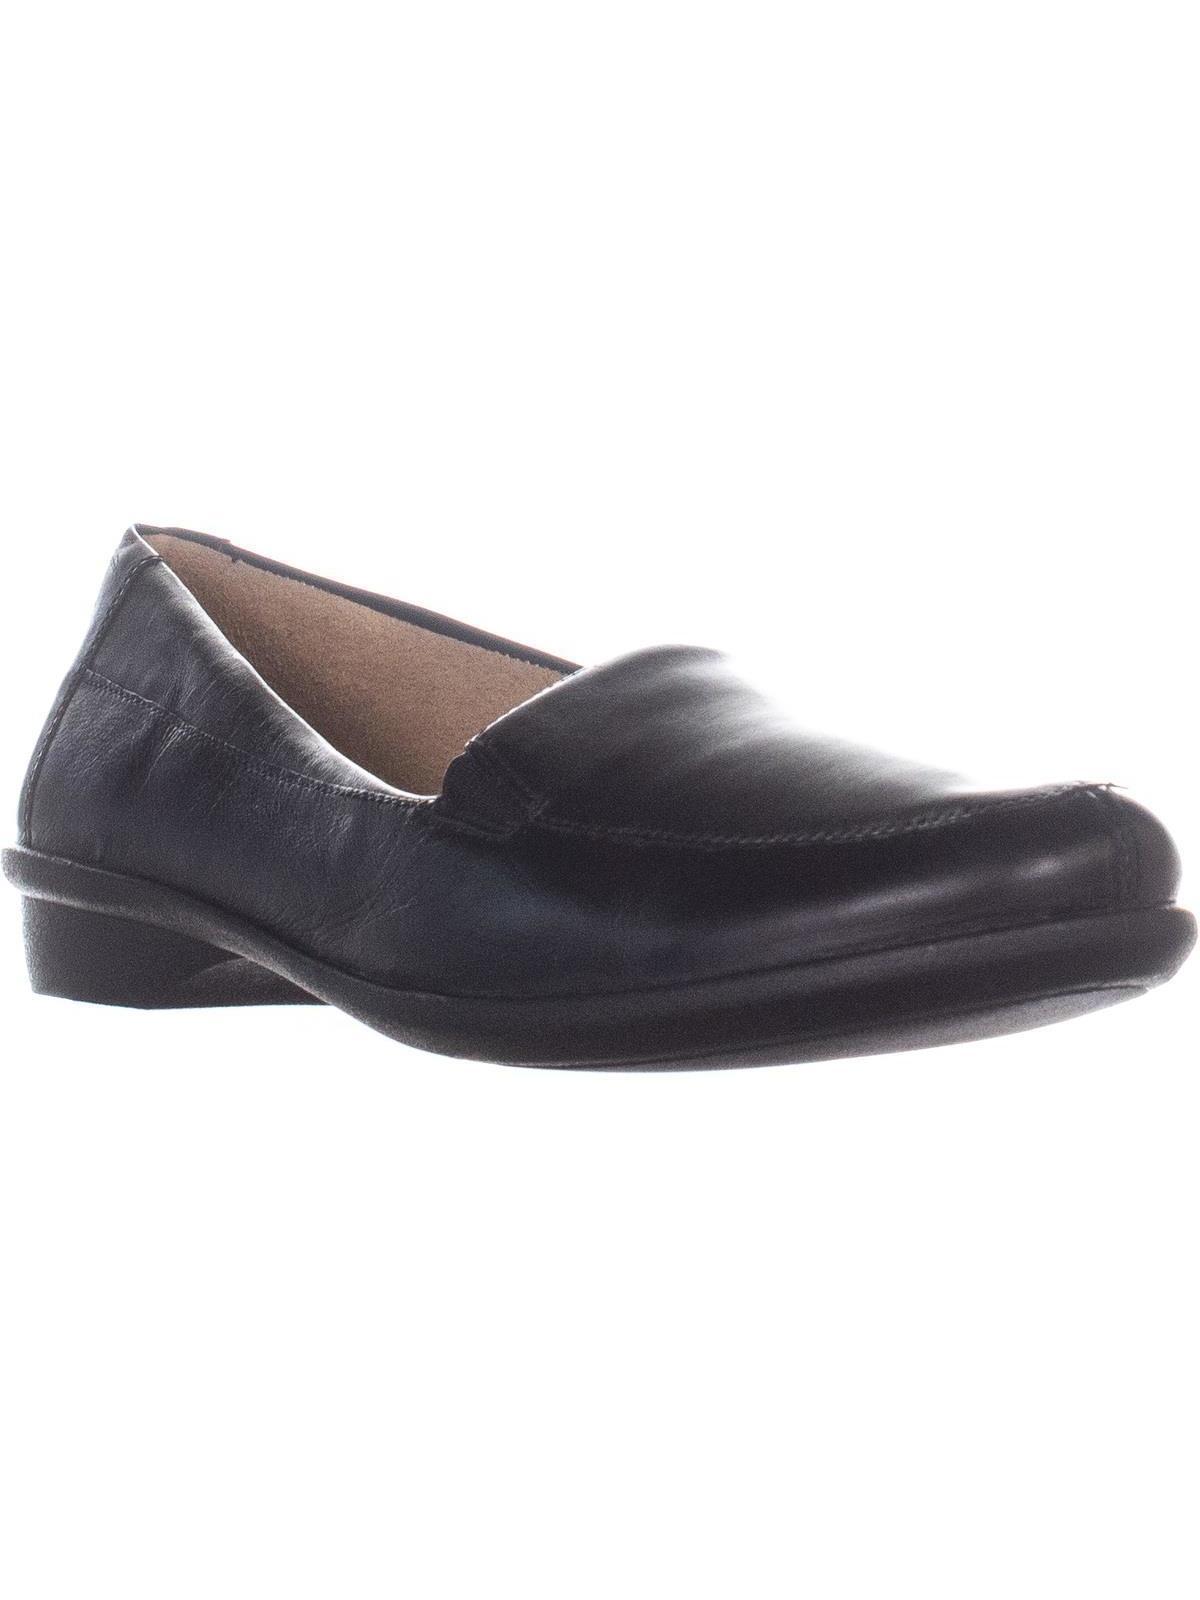 06139934773 naturalizer Panache Slip On Flats Loafers